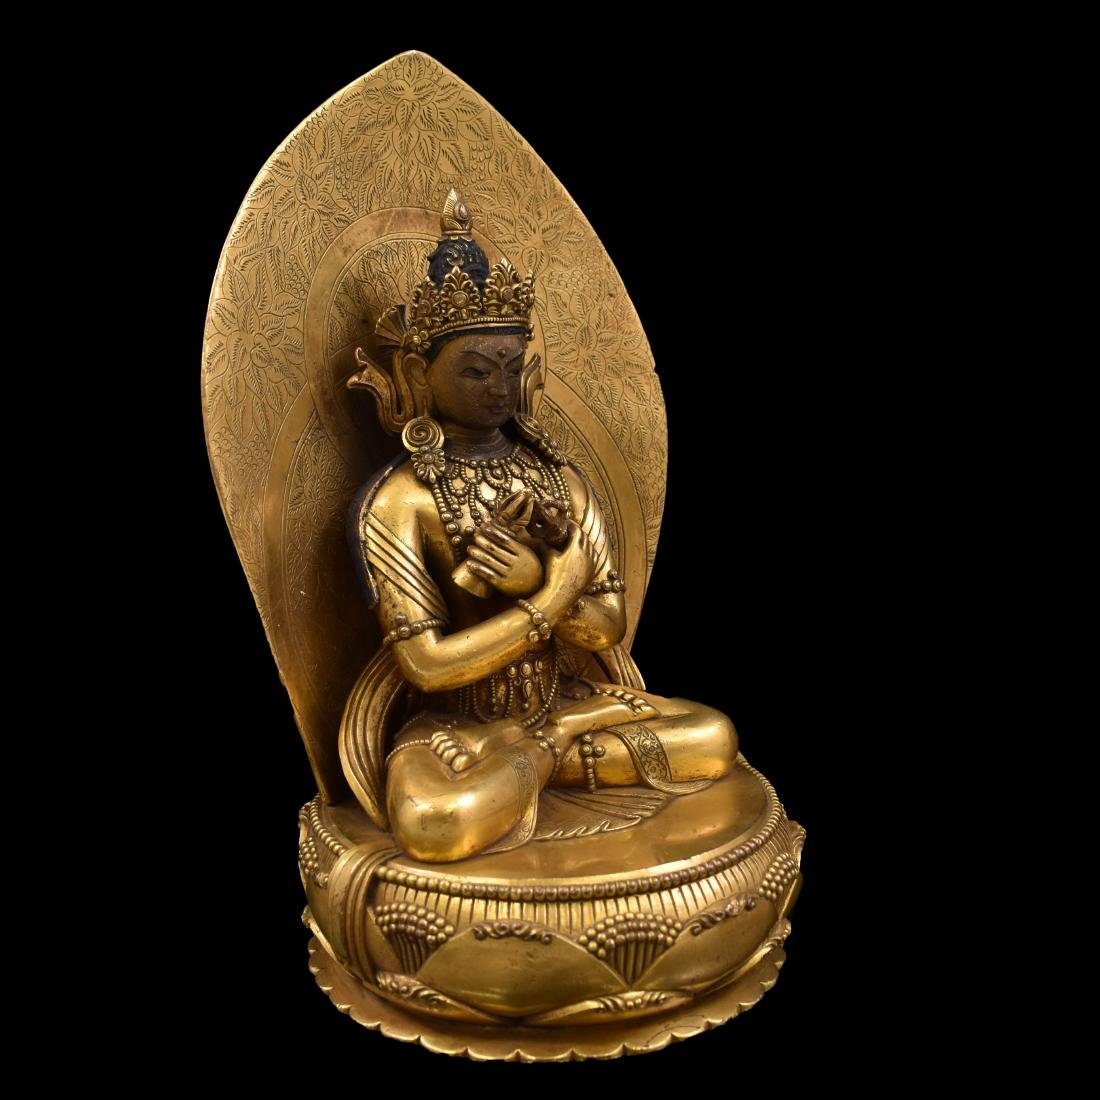 QING GILT BRONZE BUDDHA FIGURE OF VAJRADHARA & AUREOLA - 14